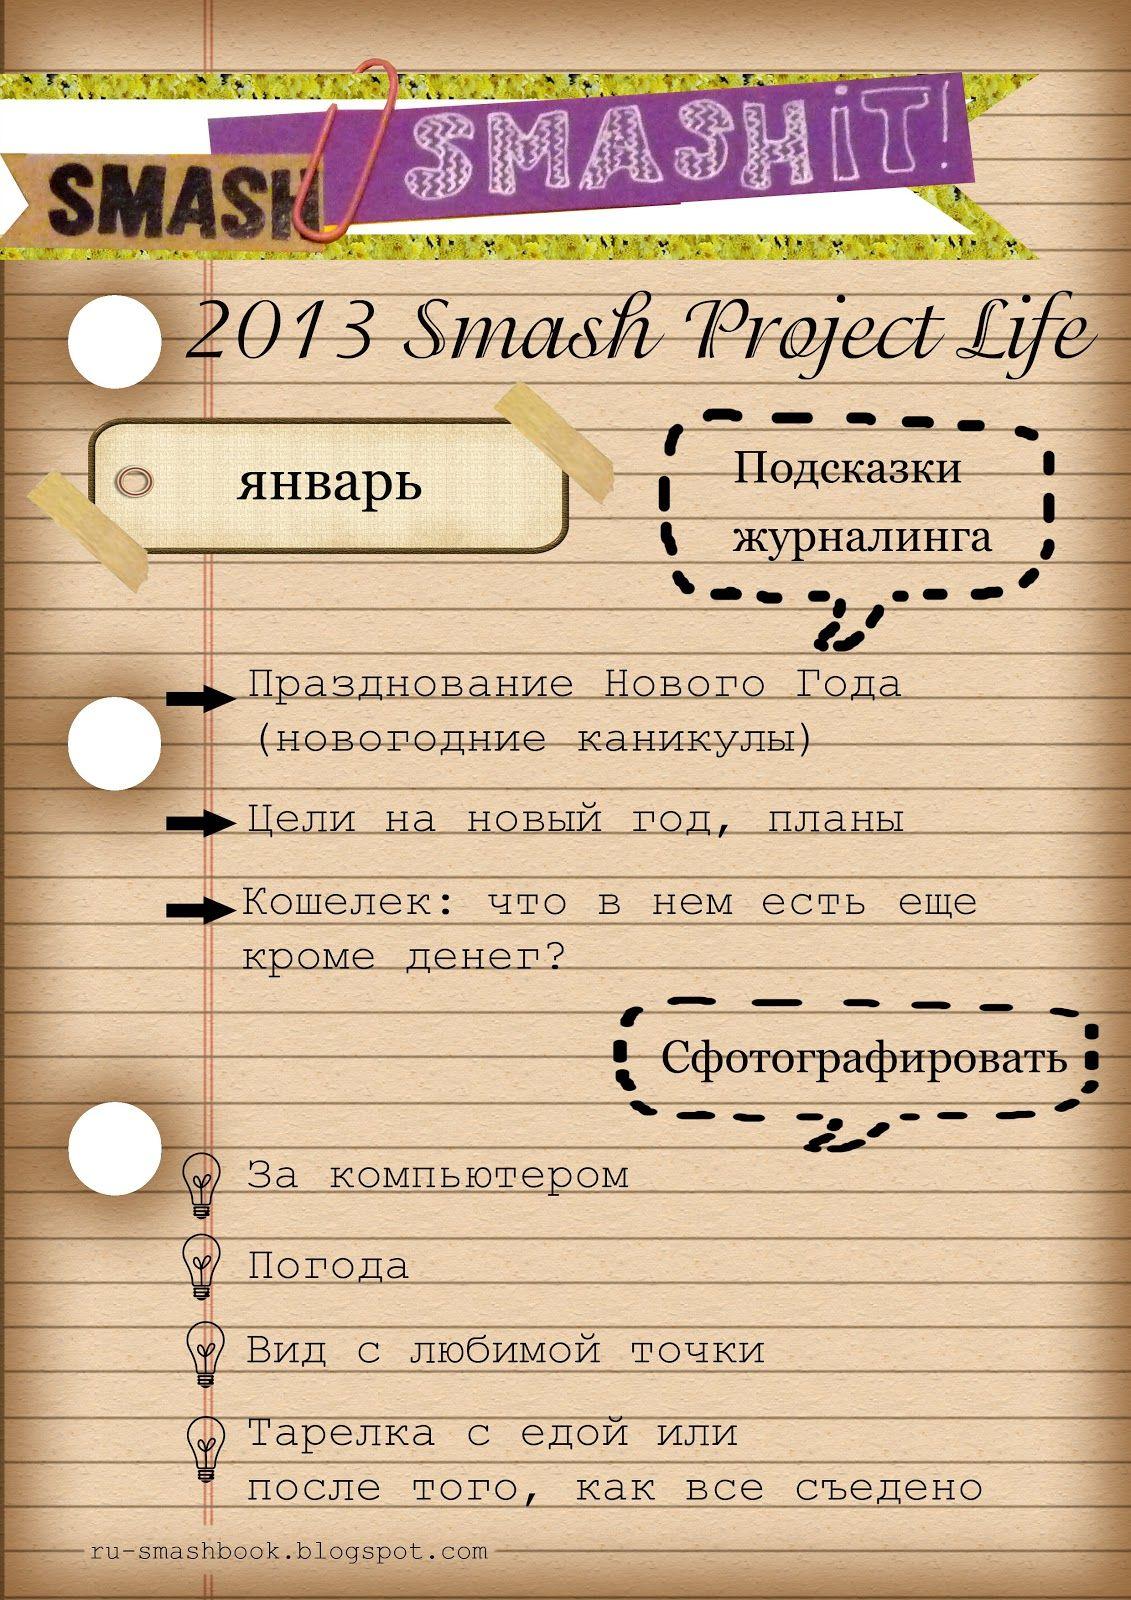 SmashIt!: Smash Project Life. Подсказки на январь (january)